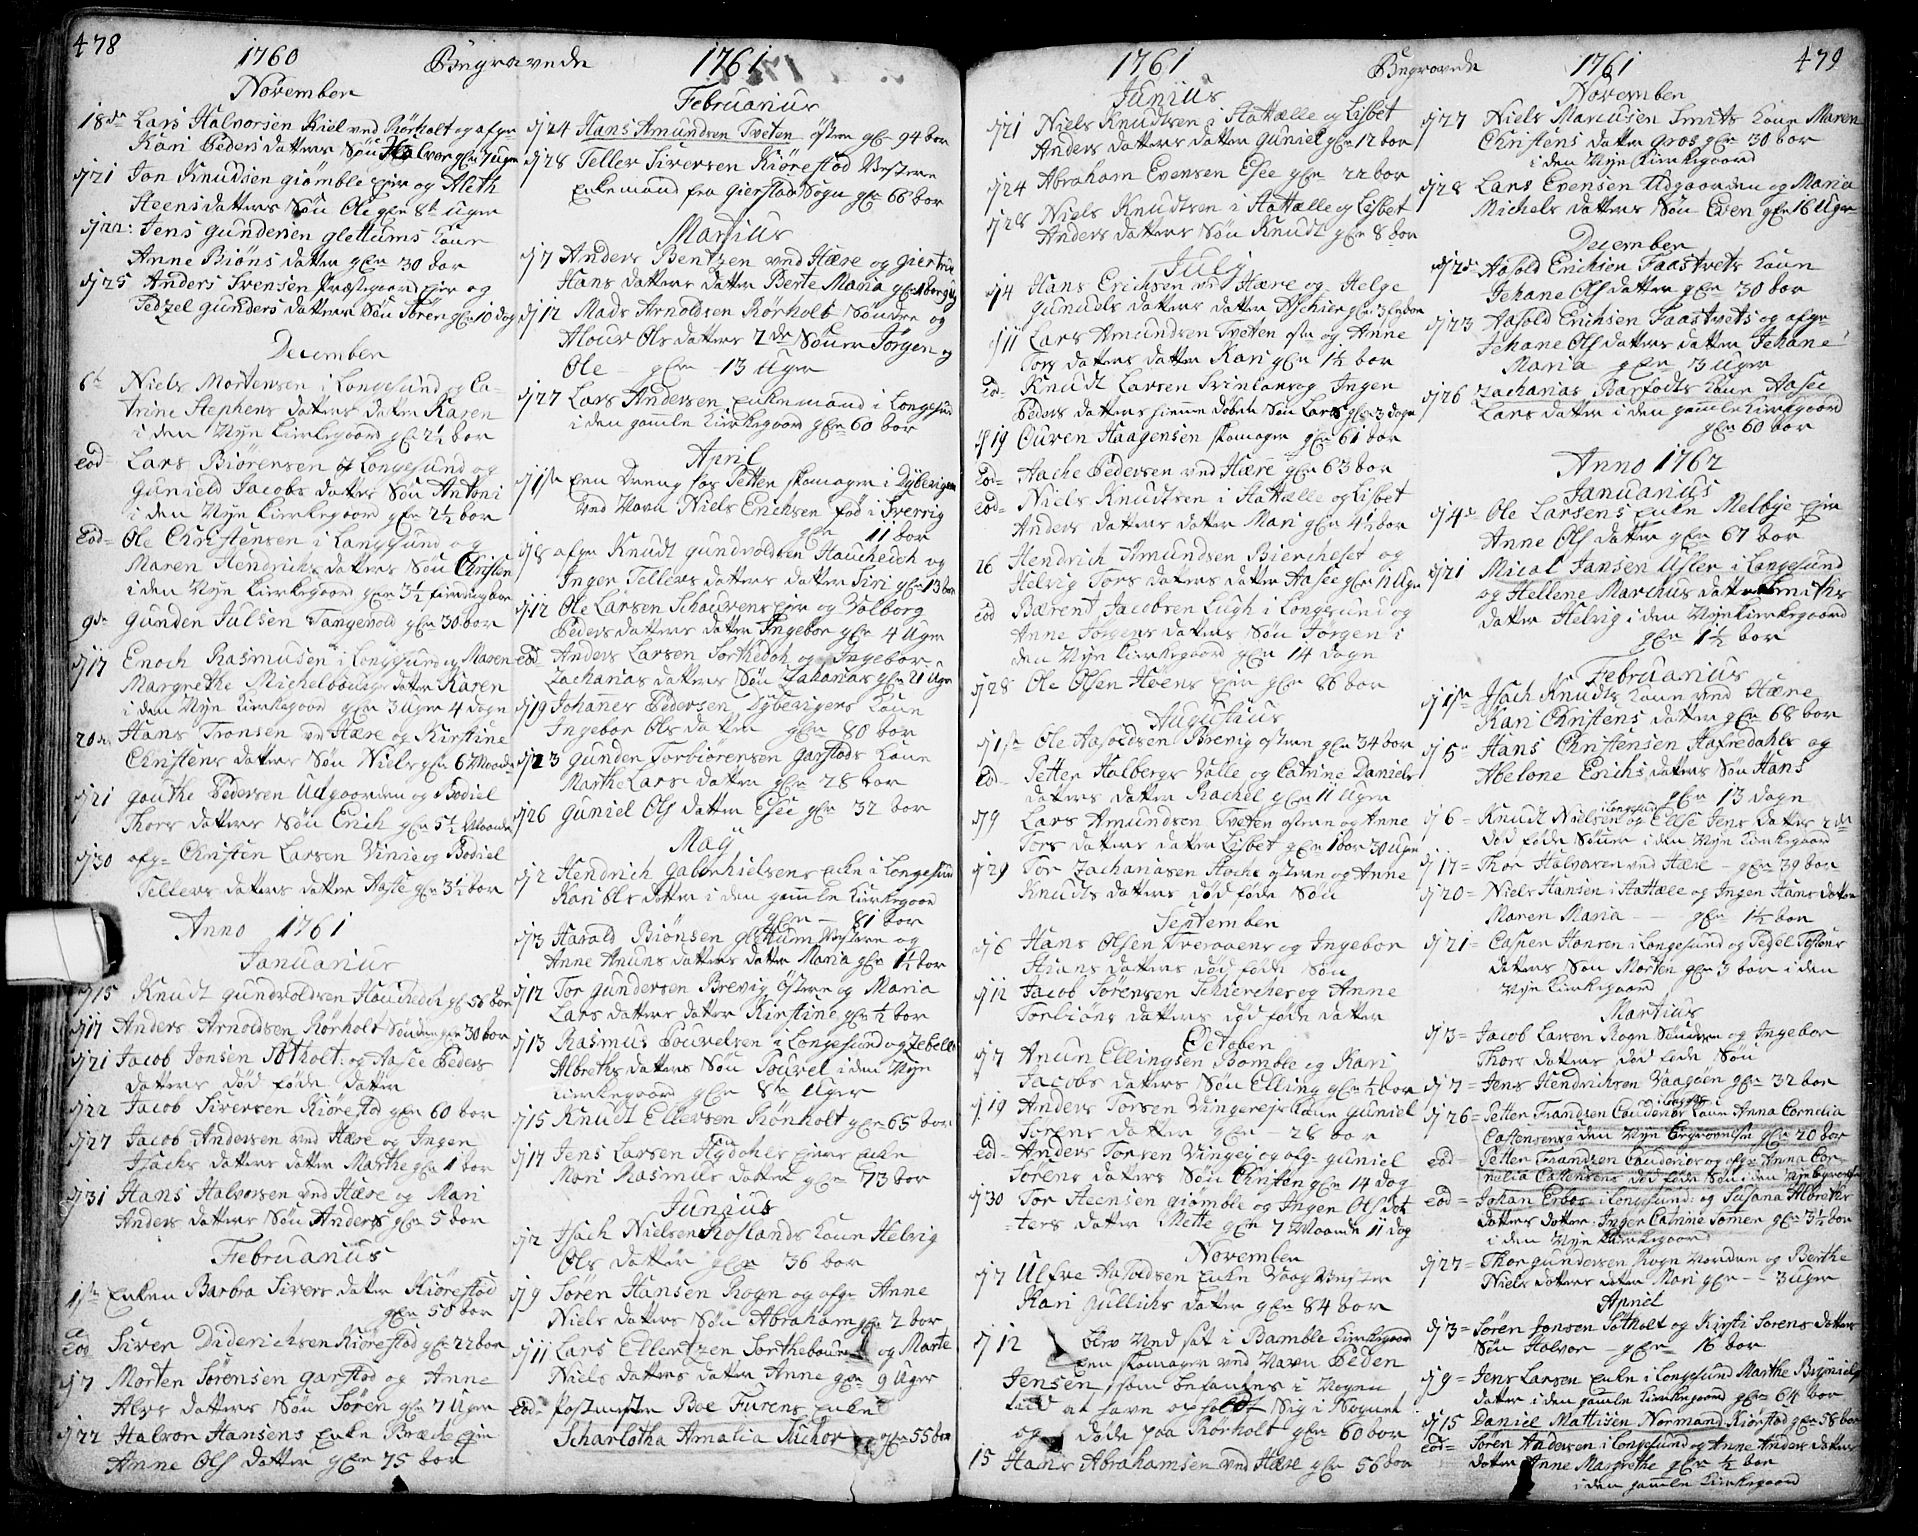 SAKO, Bamble kirkebøker, F/Fa/L0001: Ministerialbok nr. I 1, 1702-1774, s. 478-479